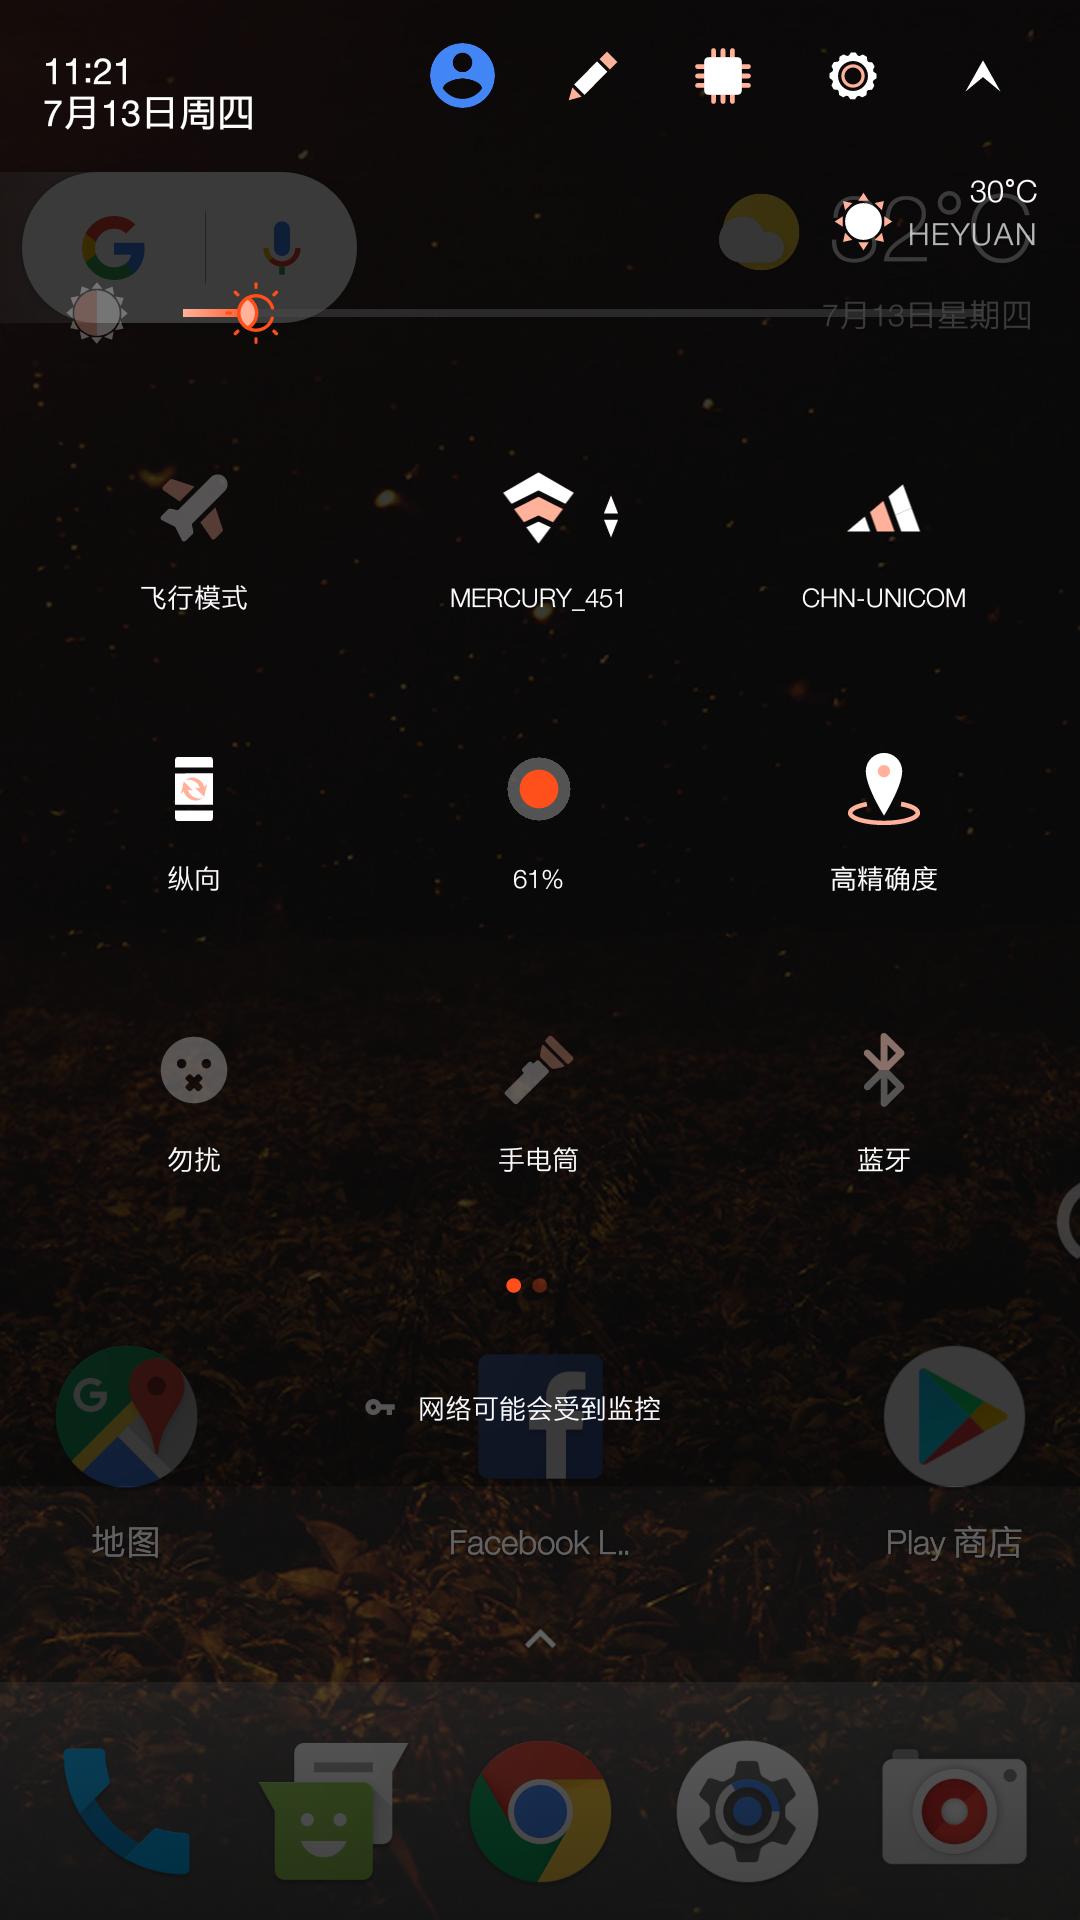 Screenshot_20170713-112132.png